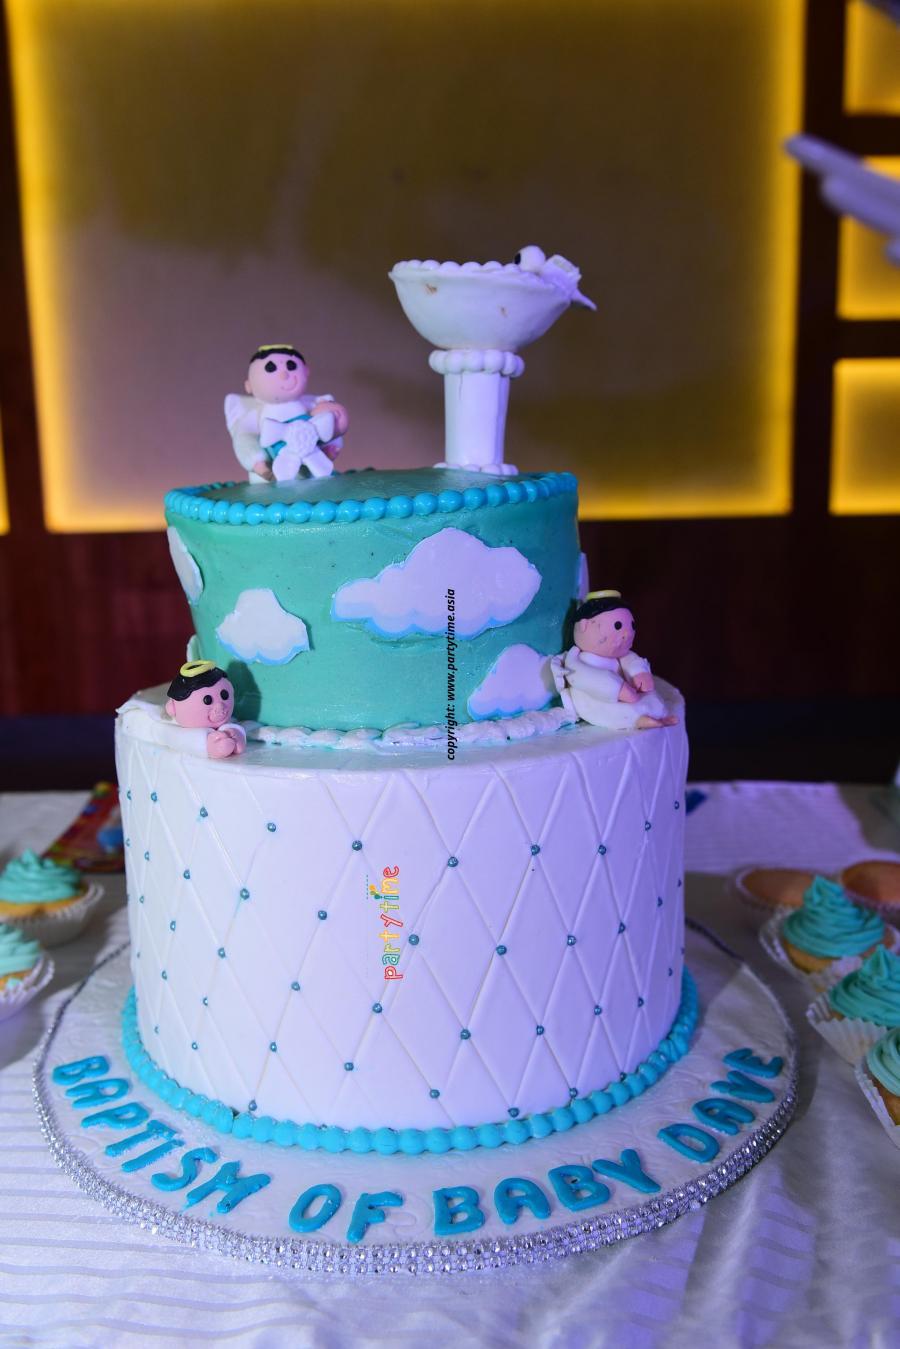 Baptism Theme Cake and Decoration Kollam Kerala - Partytime With Aladin